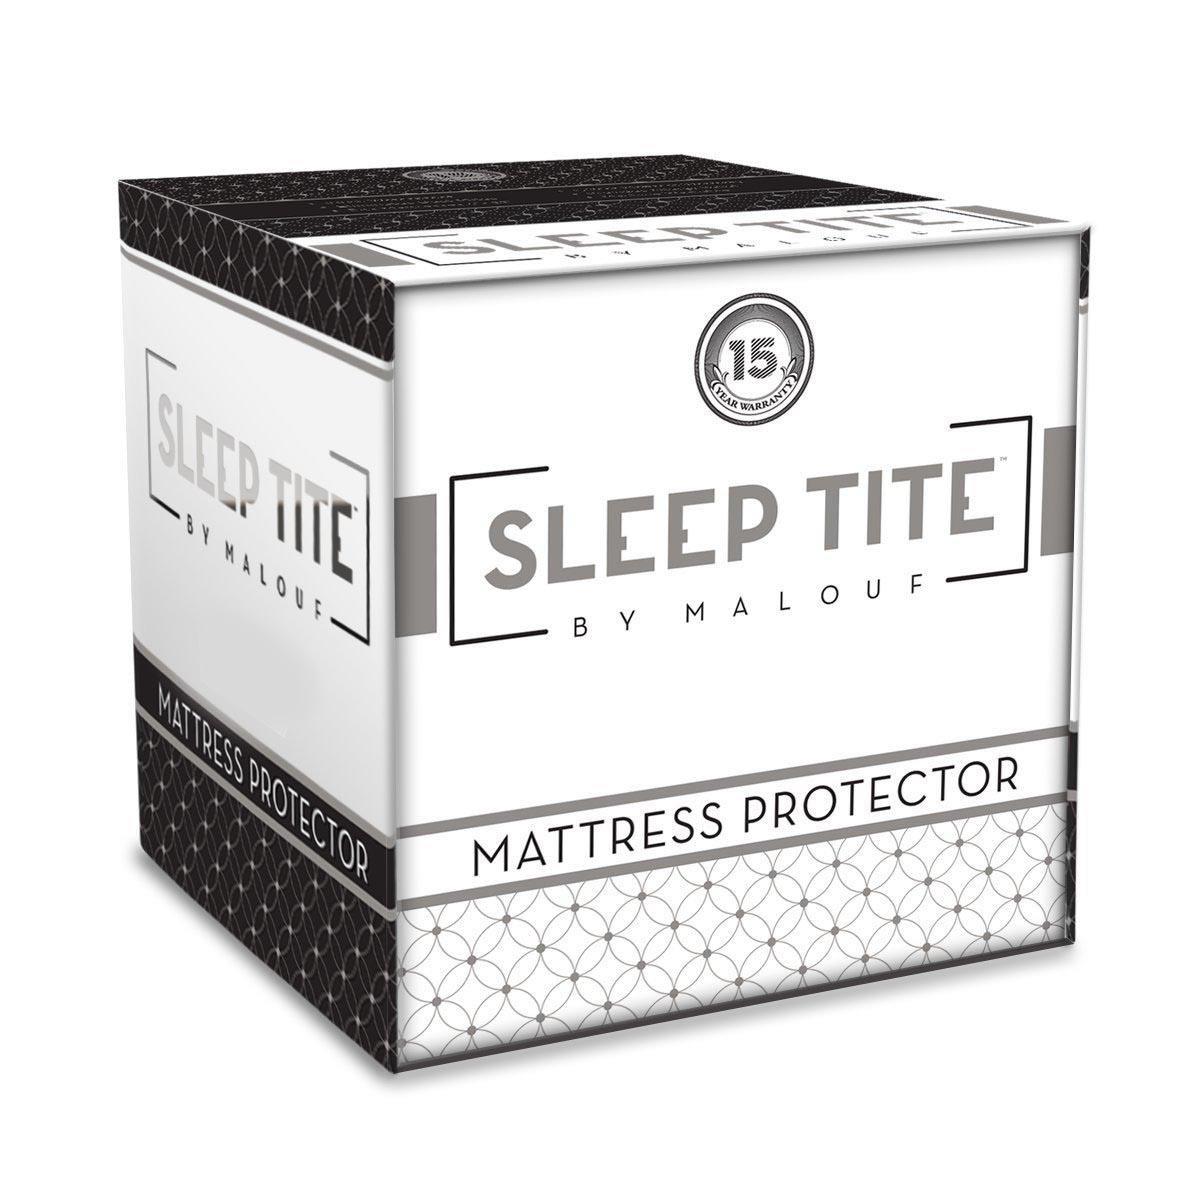 Malouf Mattress Protectors Twin XL Sleeptite Mattress Protector - Item Number: SLOOTXMP